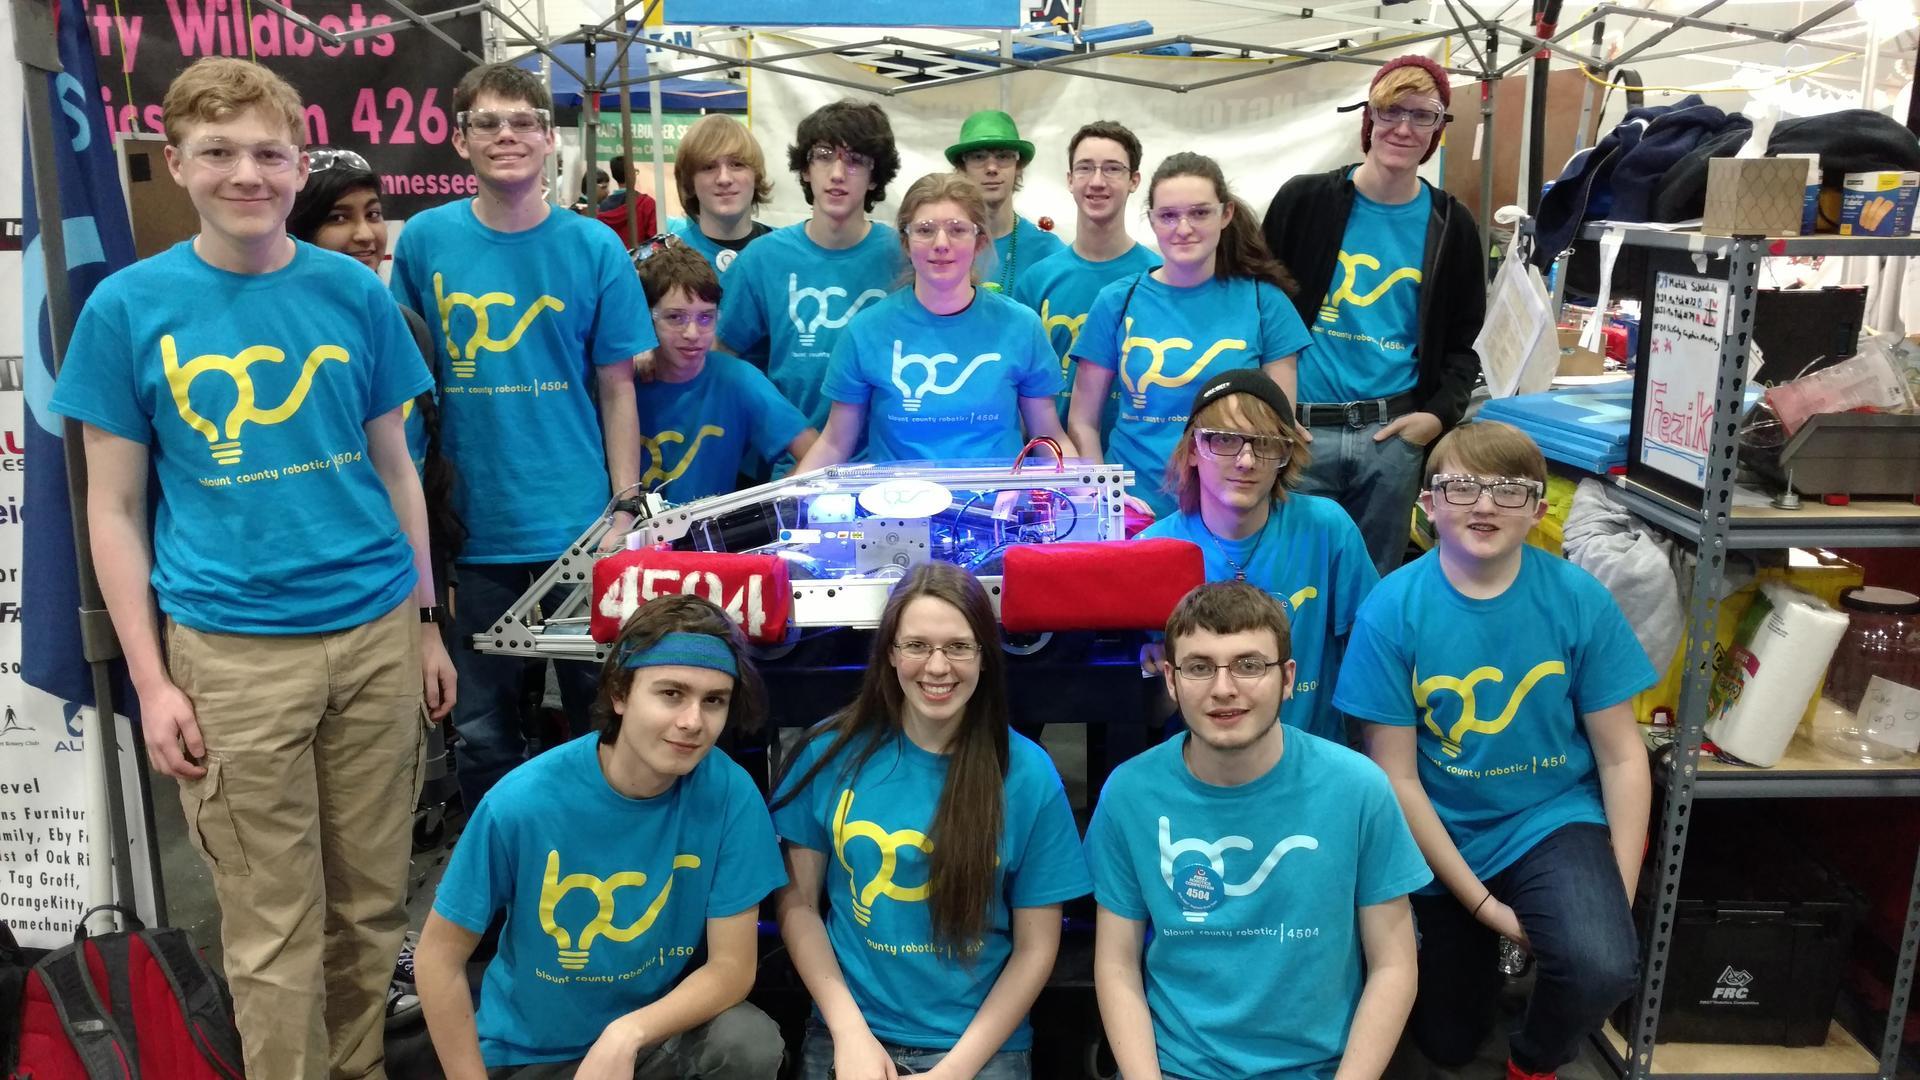 BCR Team #4504